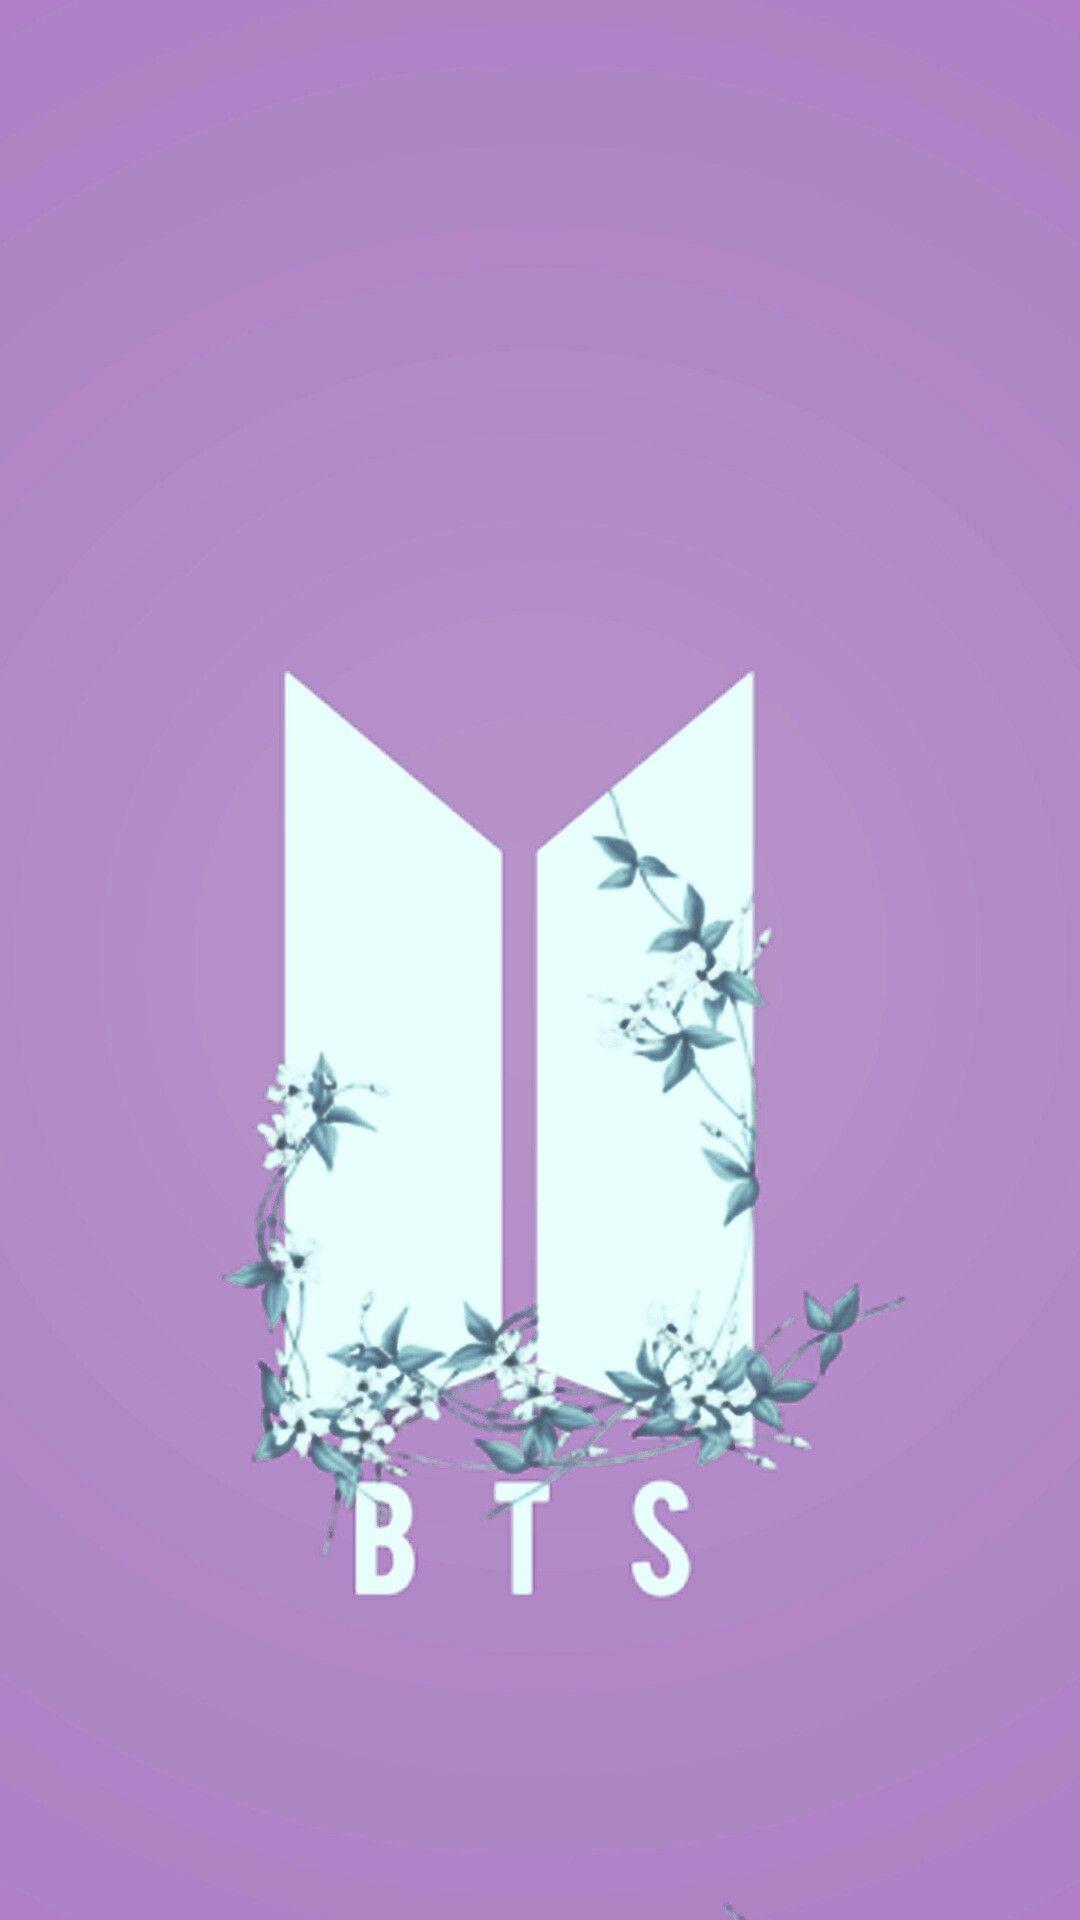 BTS Logo Wallpapers Wallpaper Cave